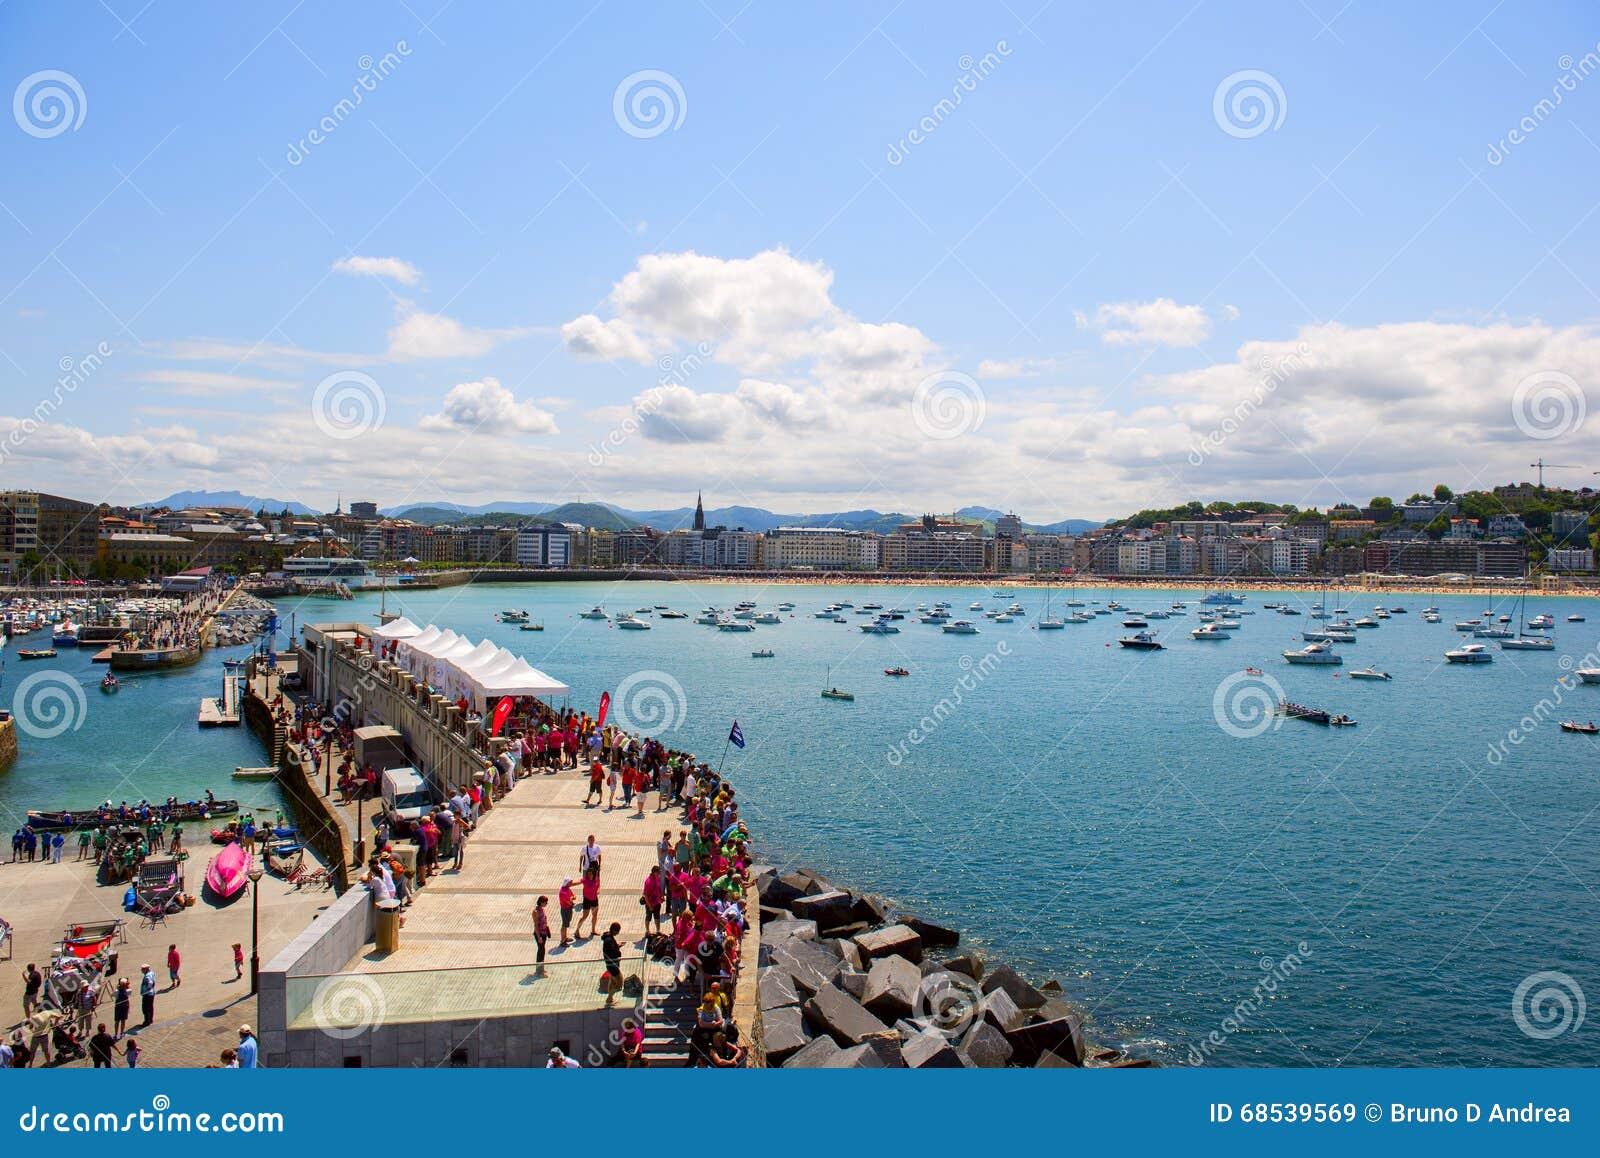 SAN SEBASTIAN, SPAIN JULY 12, 2015, view of the beach